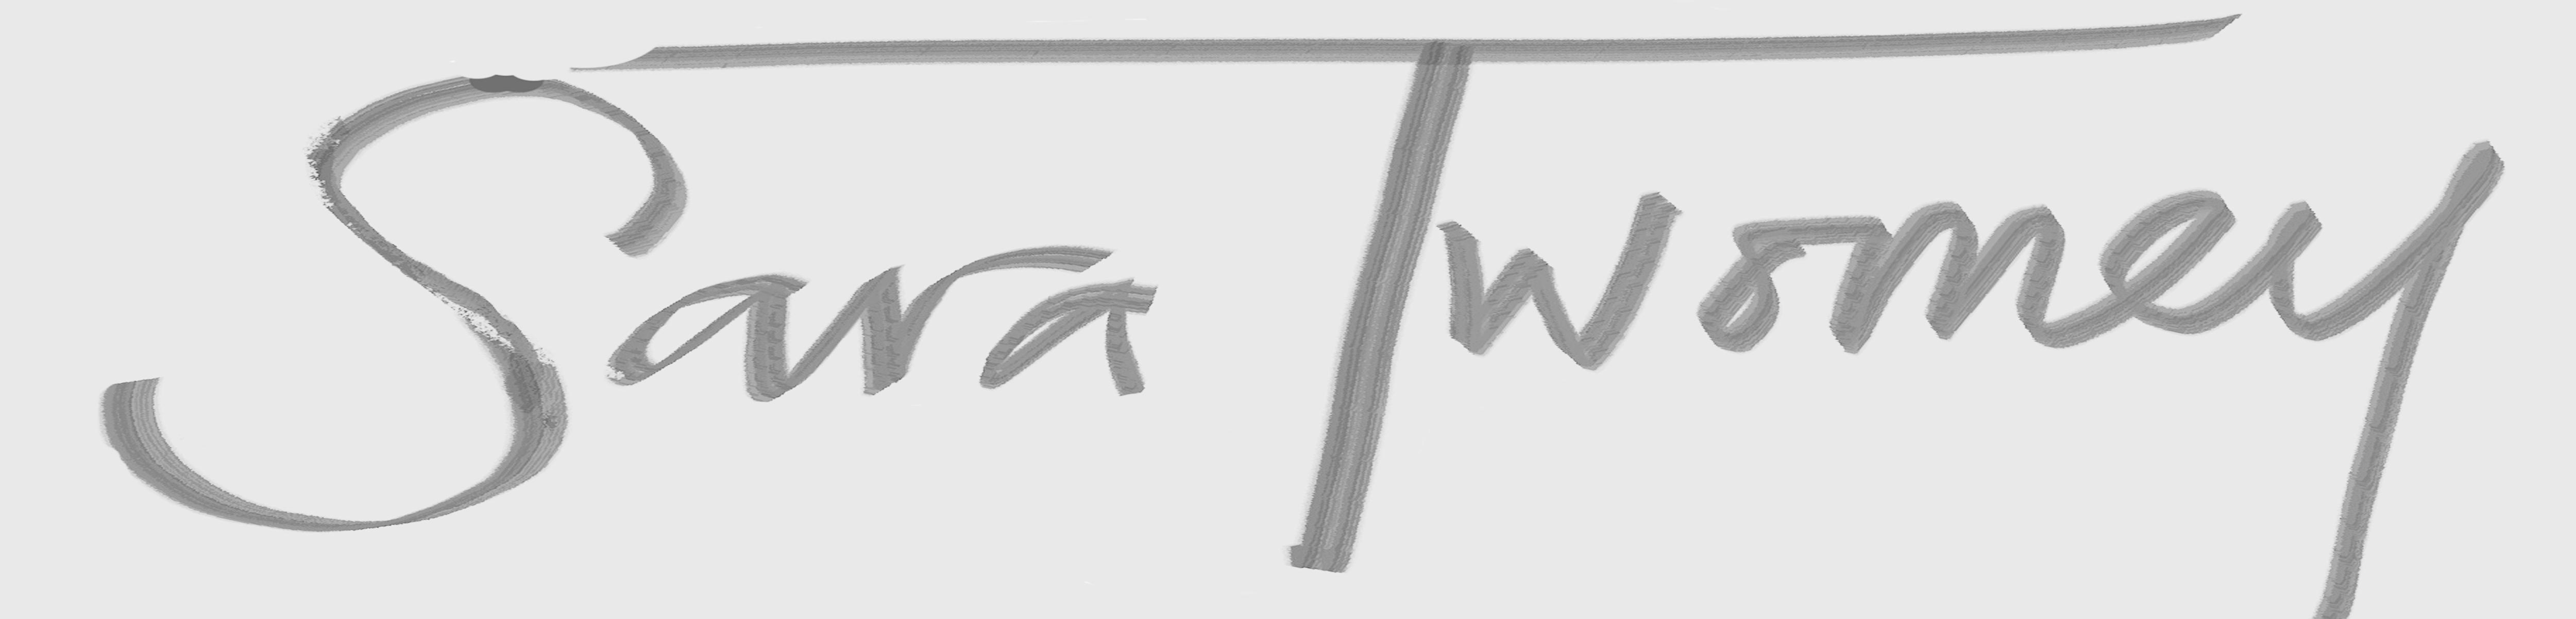 Sara Twomey's Signature